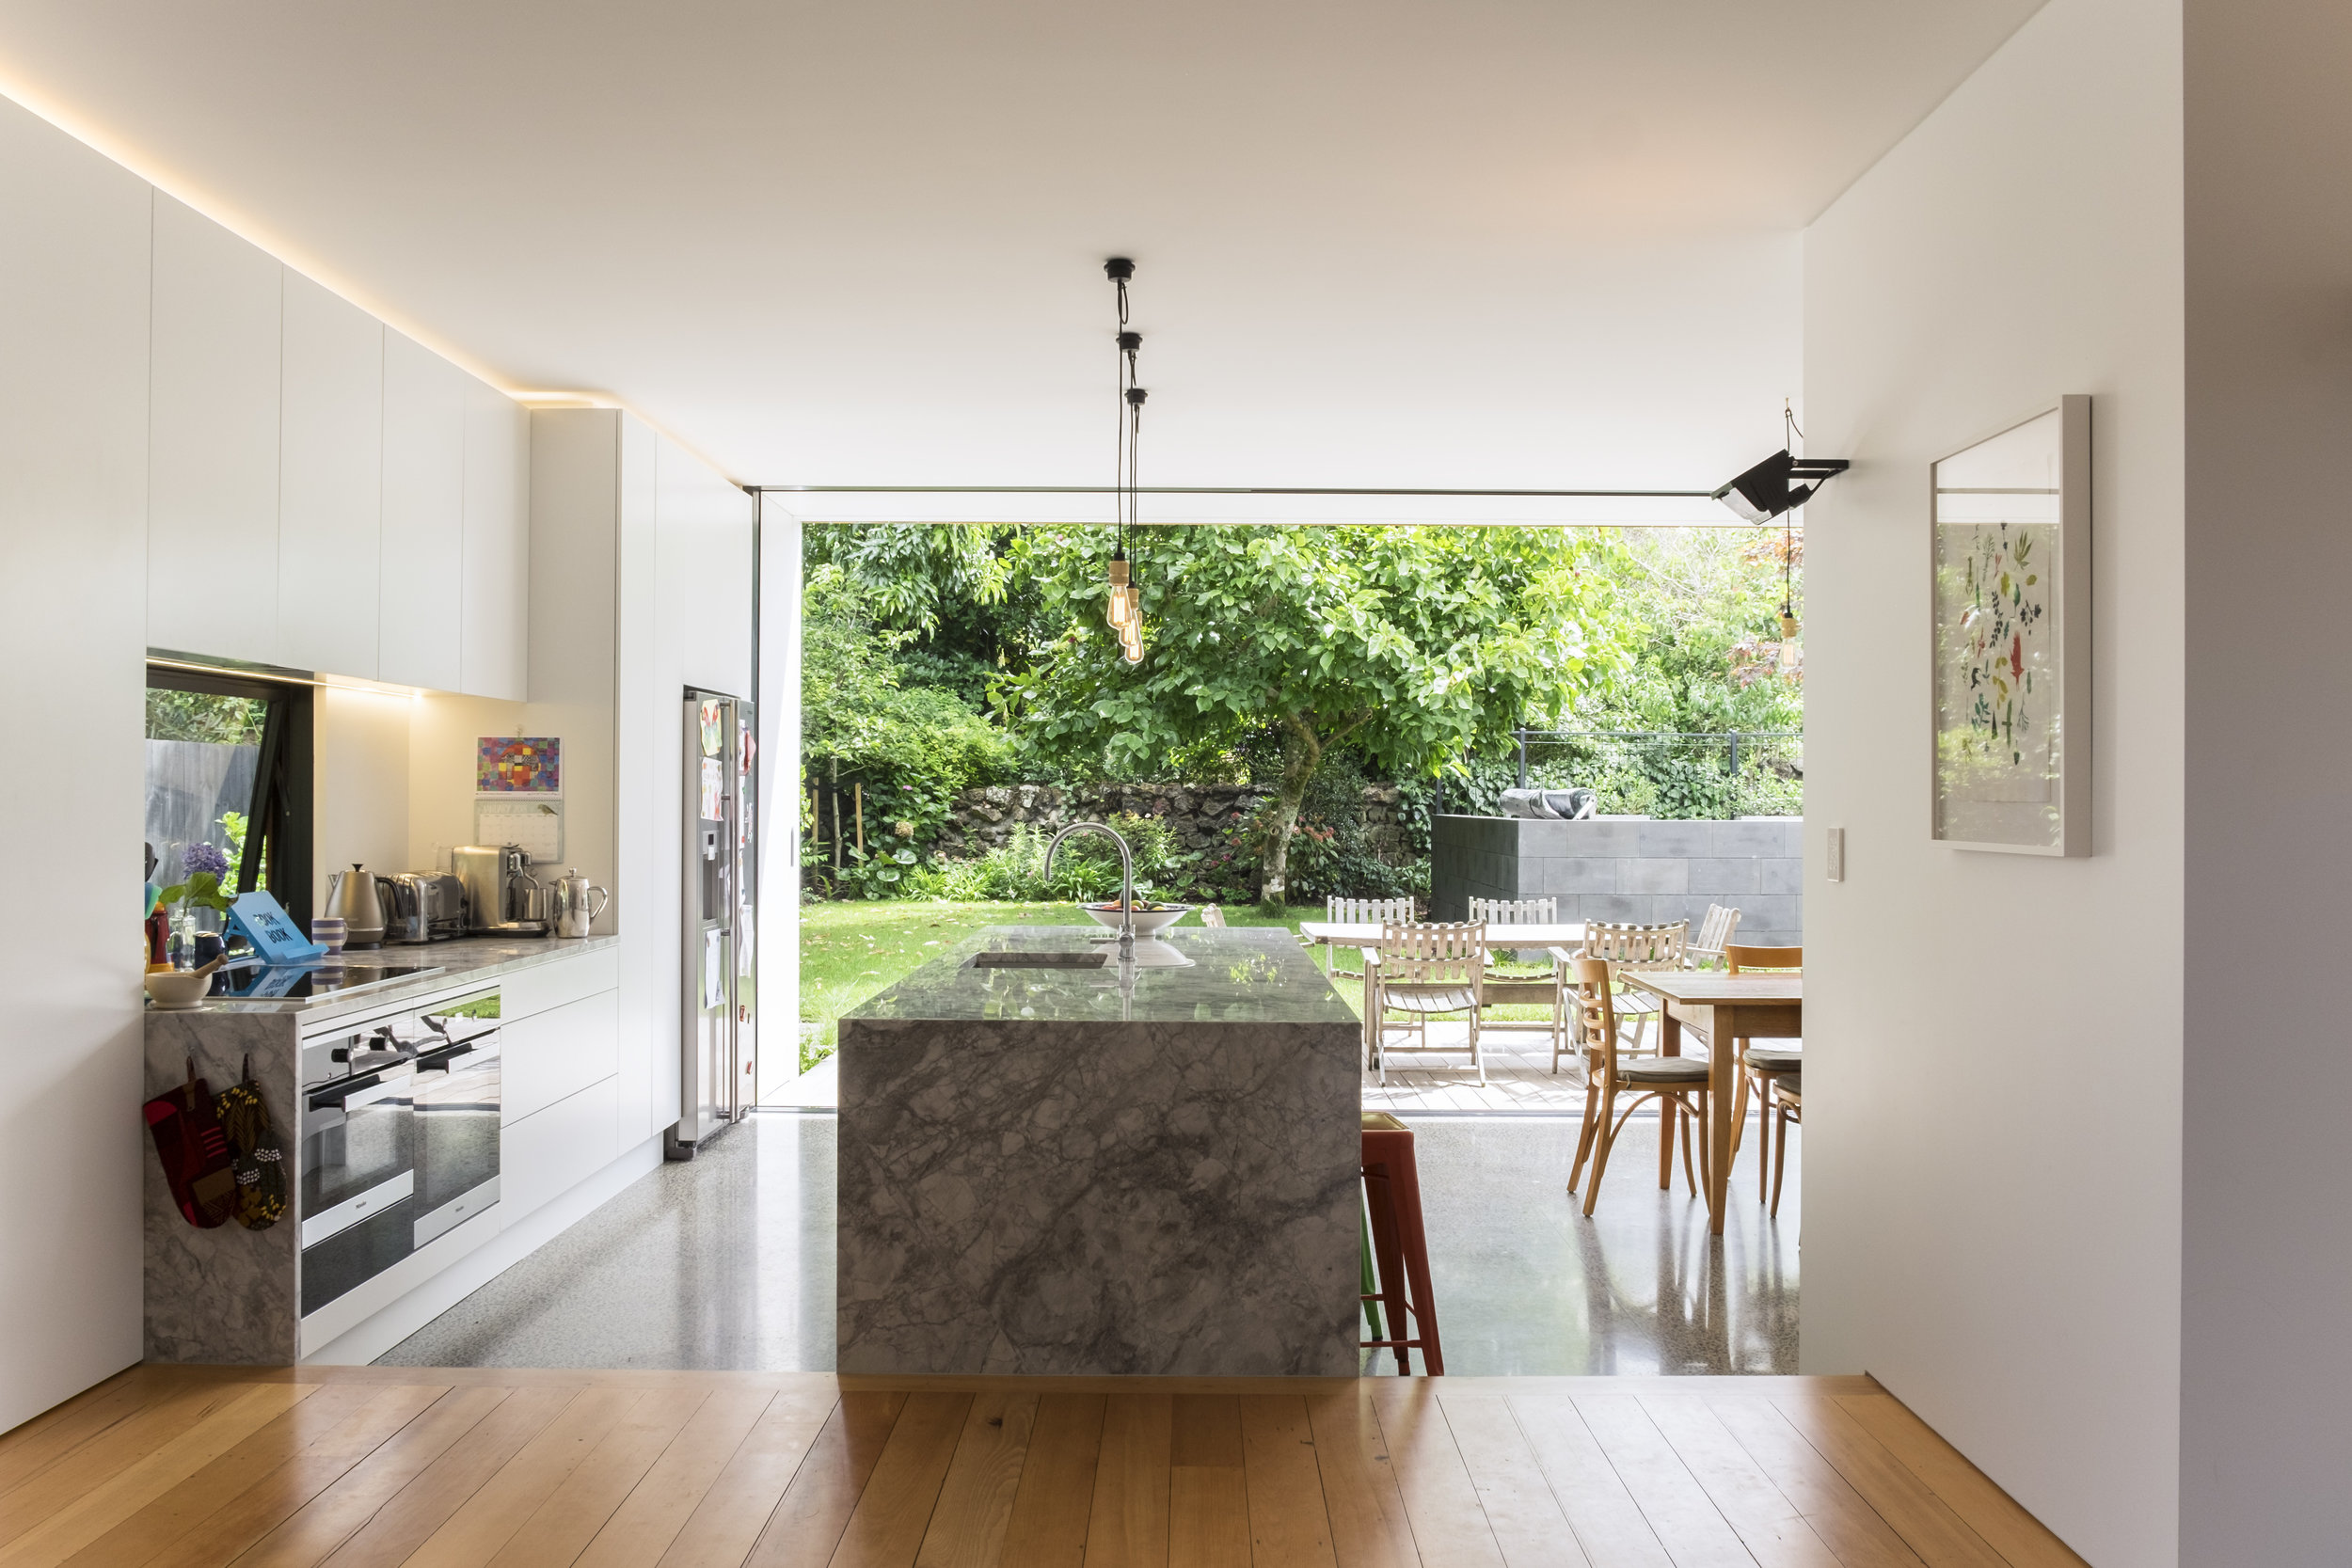 Case Study Villa_View from kitchen_2 of 10.jpg